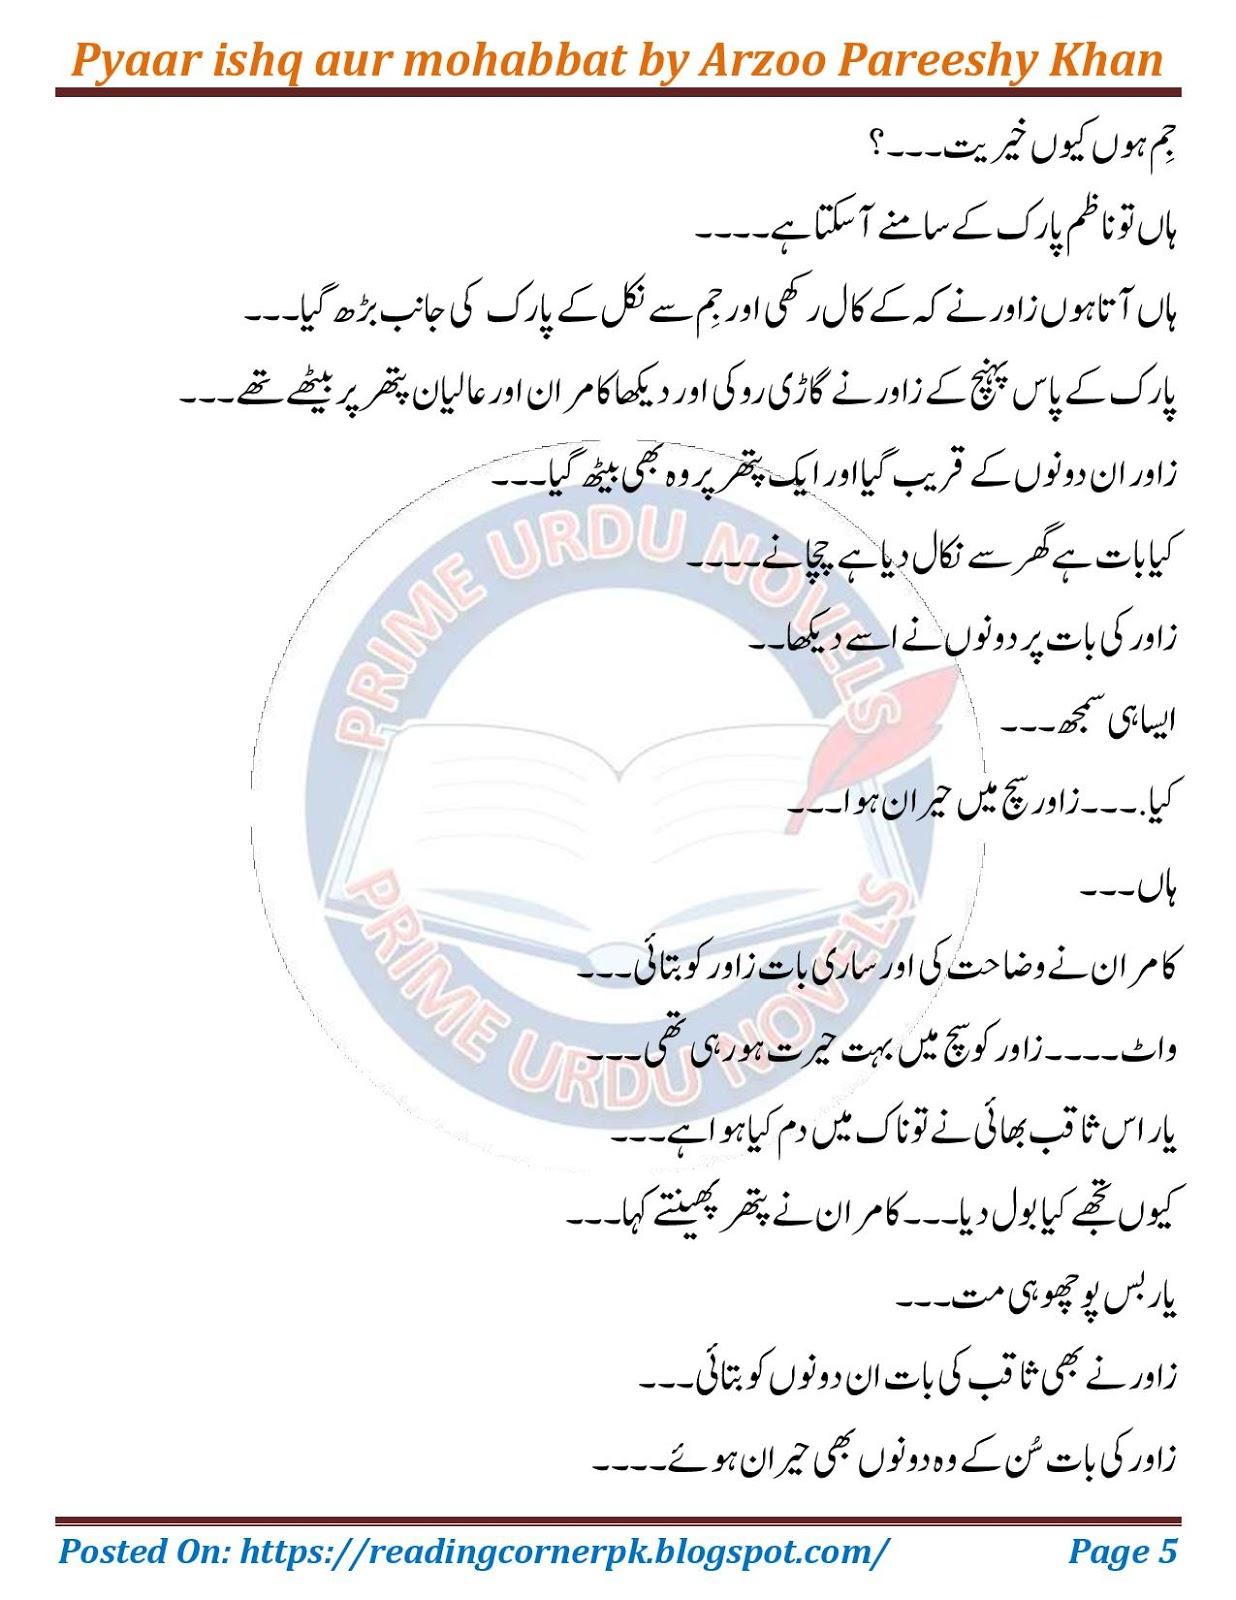 Kutab Library: Pyaar ishq aur mohabbat novel pdf by Arzu Pareeshy